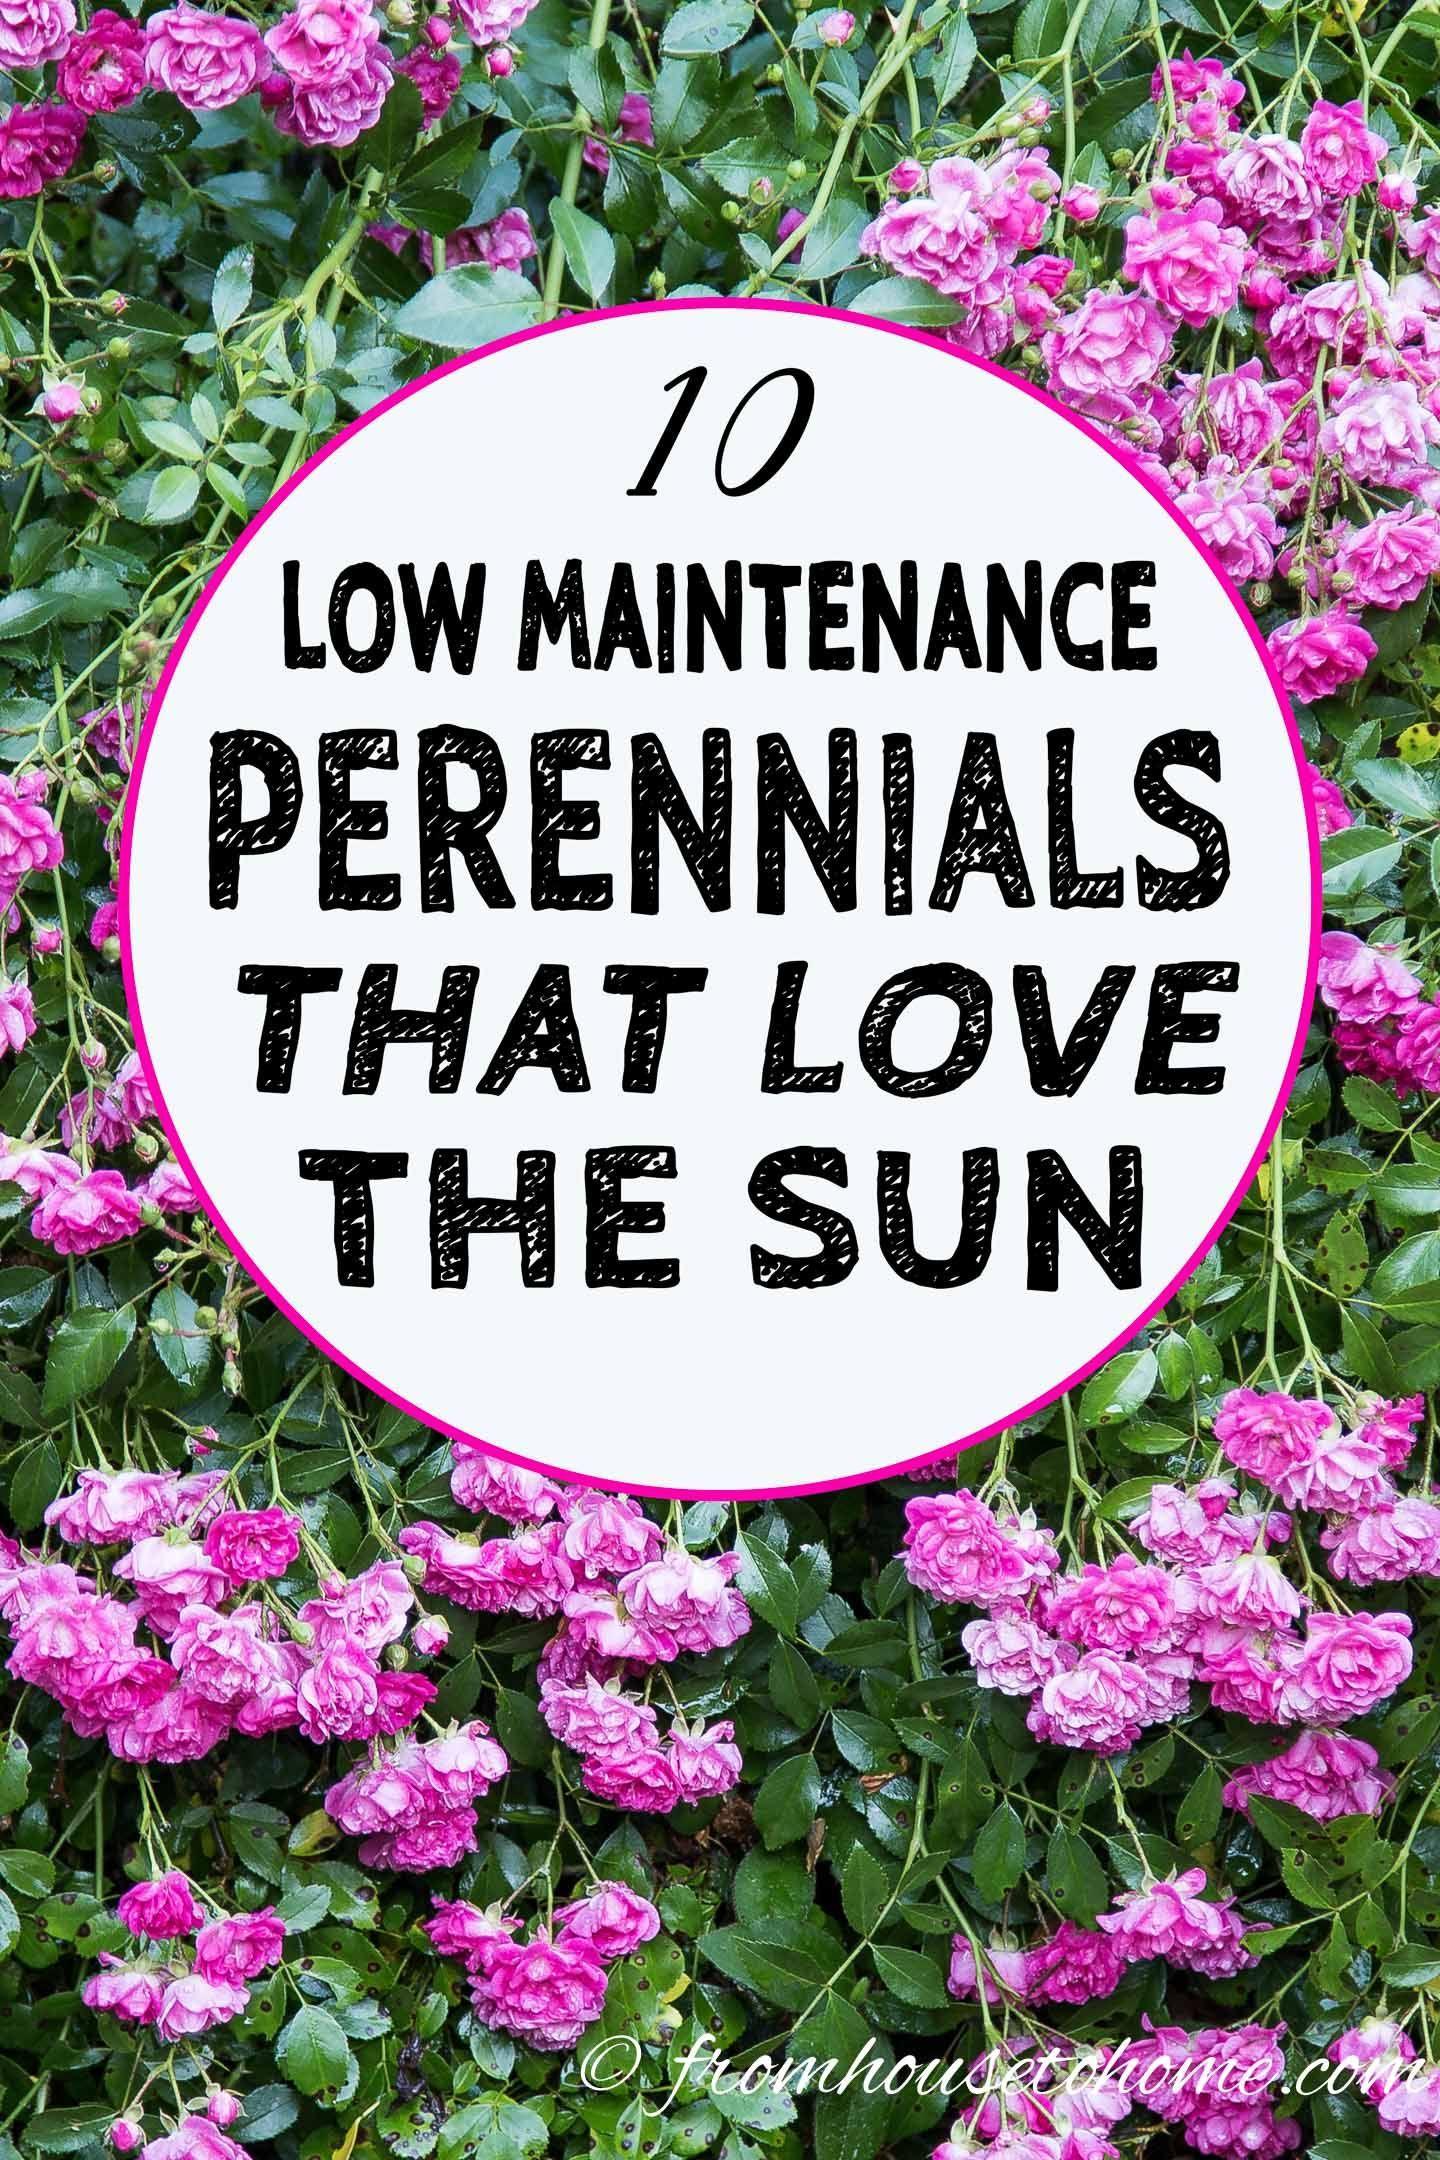 Full Sun Perennials 15 Beautiful Low Maintenance Plants That Thrive In The Sun Gardening From House To Home Full Sun Perennials Full Sun Garden Sun Perennials